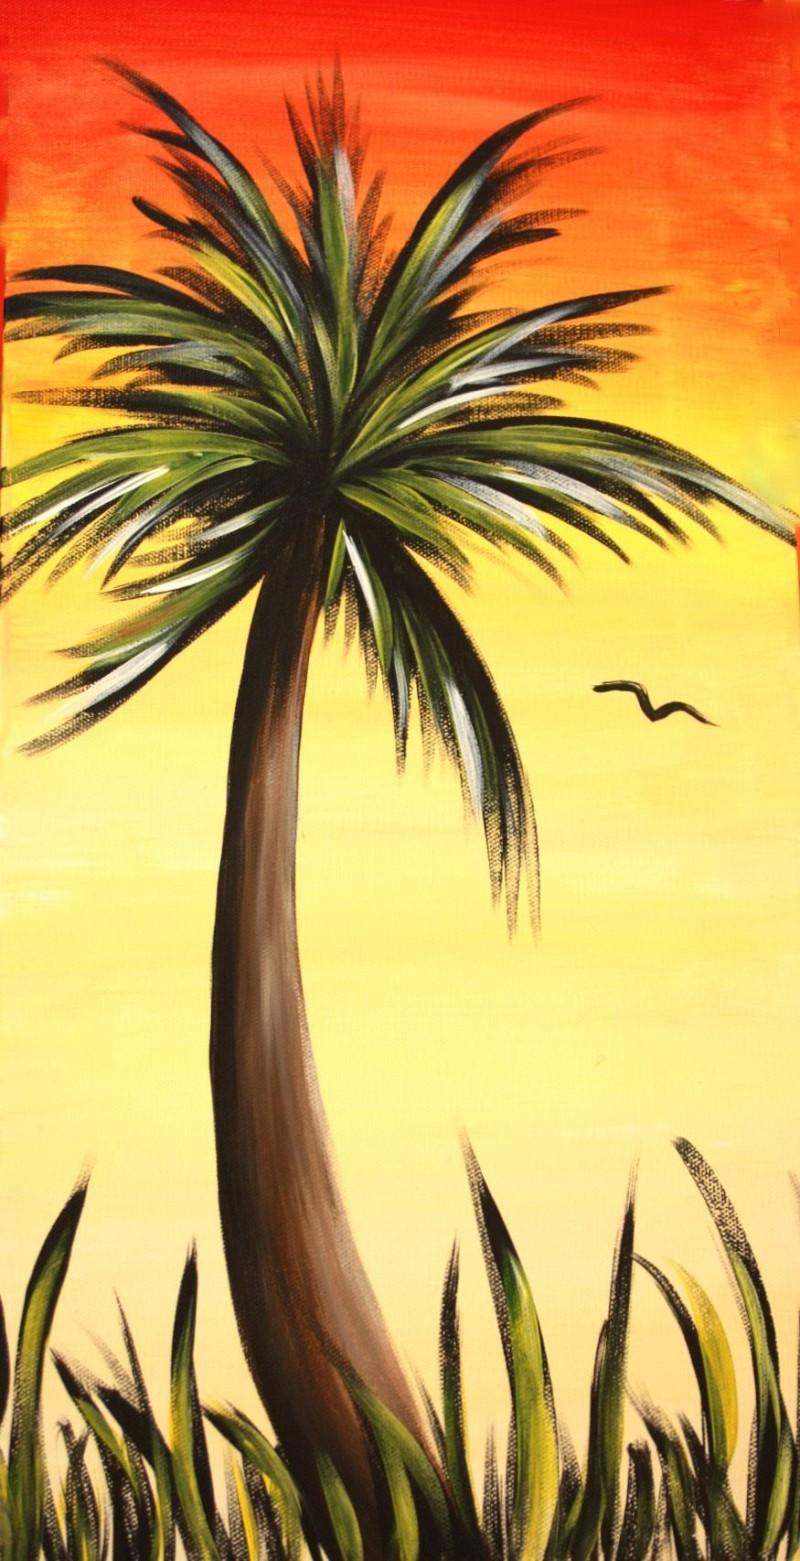 Happy Hour Sunday! Rasta Palm 3pm-5pm - In Studio Class